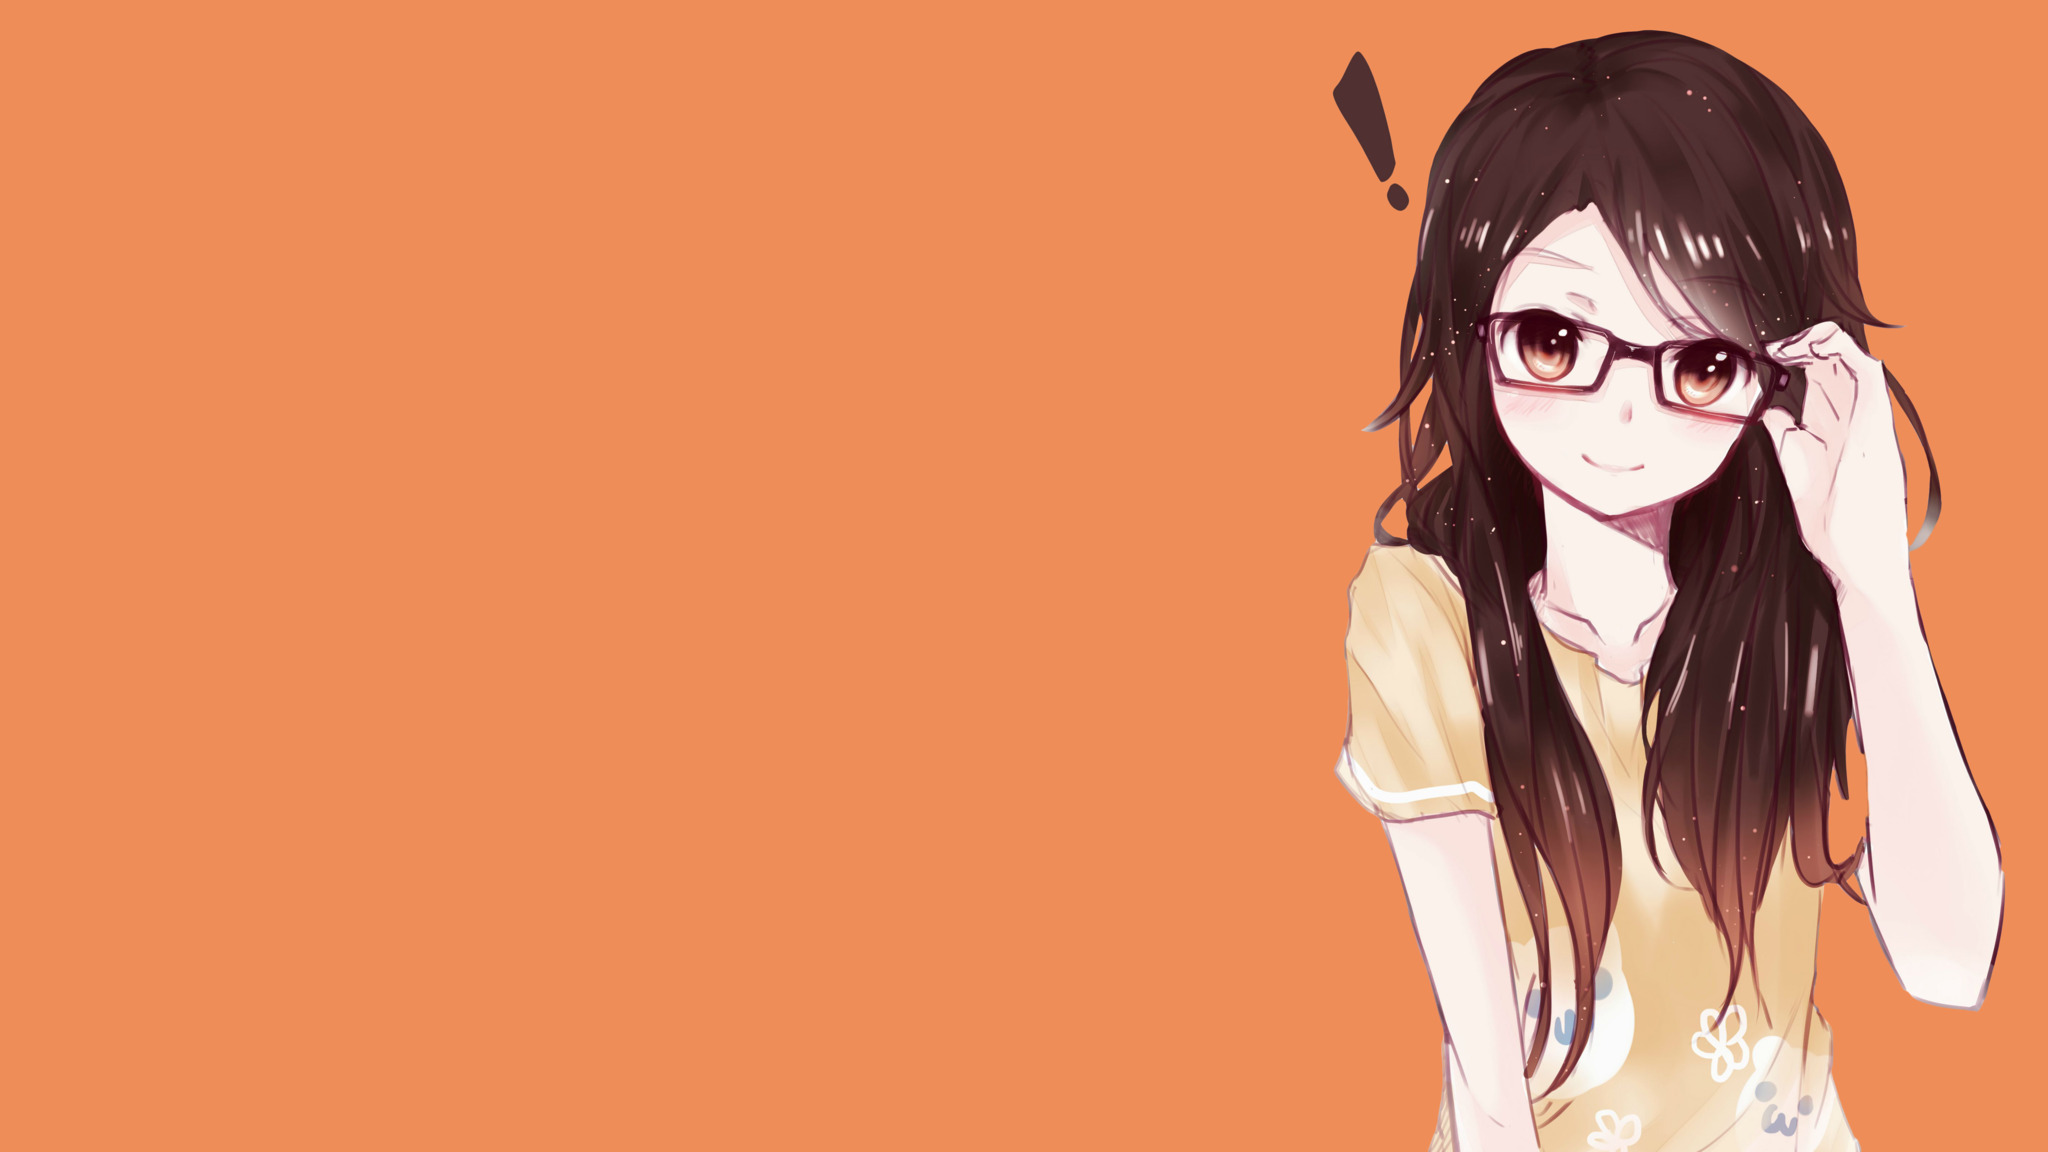 2048x1152 Anime Girl 1 2048x1152 Resolution Hd 4k Wallpapers